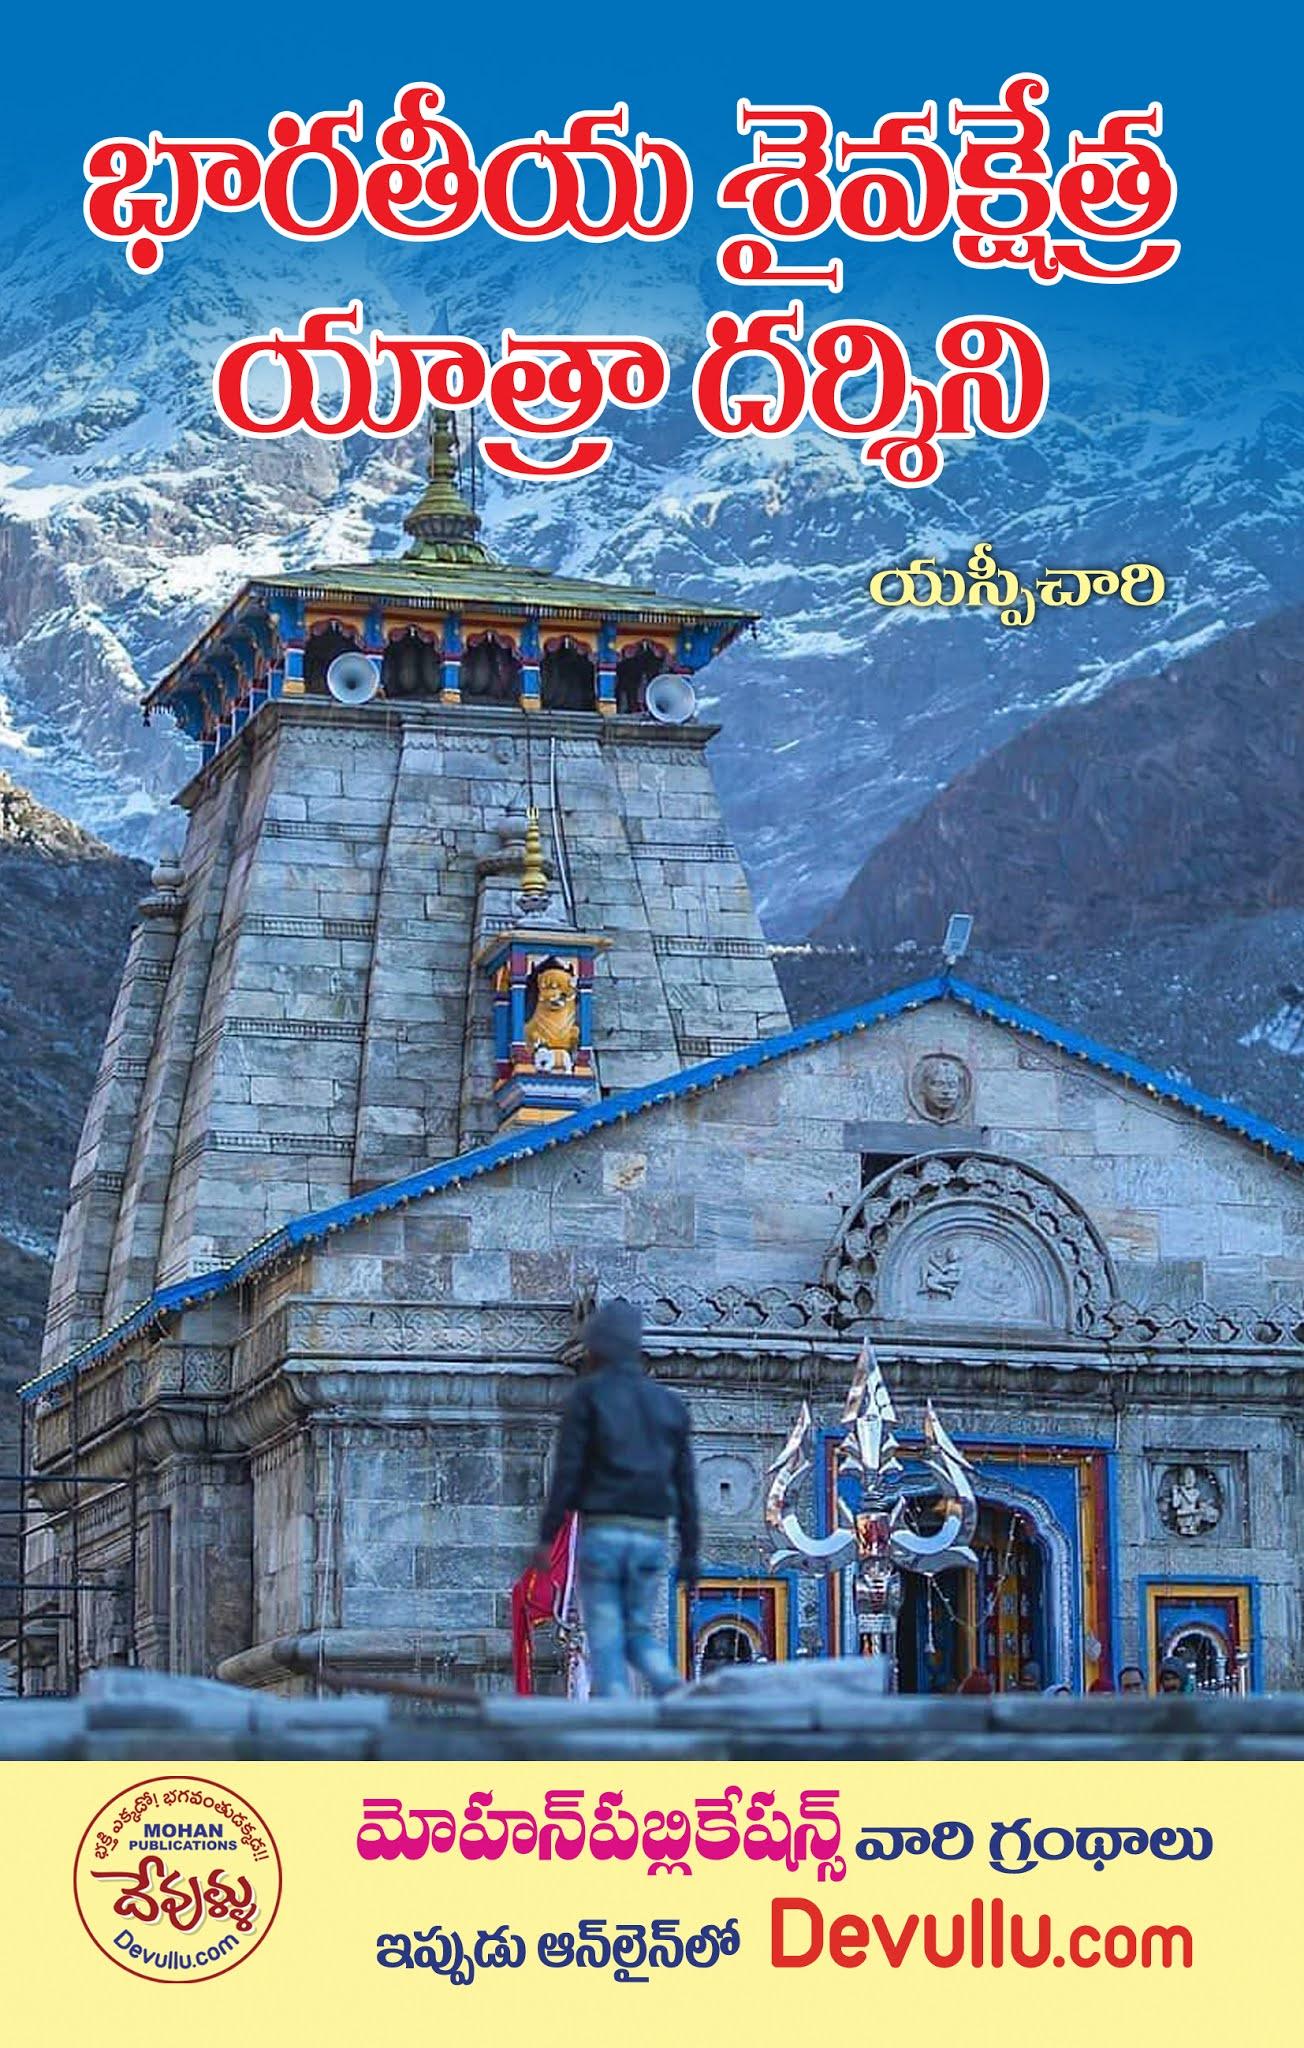 bharateeya Saivakshetra yatra darshini | భారతీయ శైవక్షేత్ర యాత్ర దర్శని | telugu books